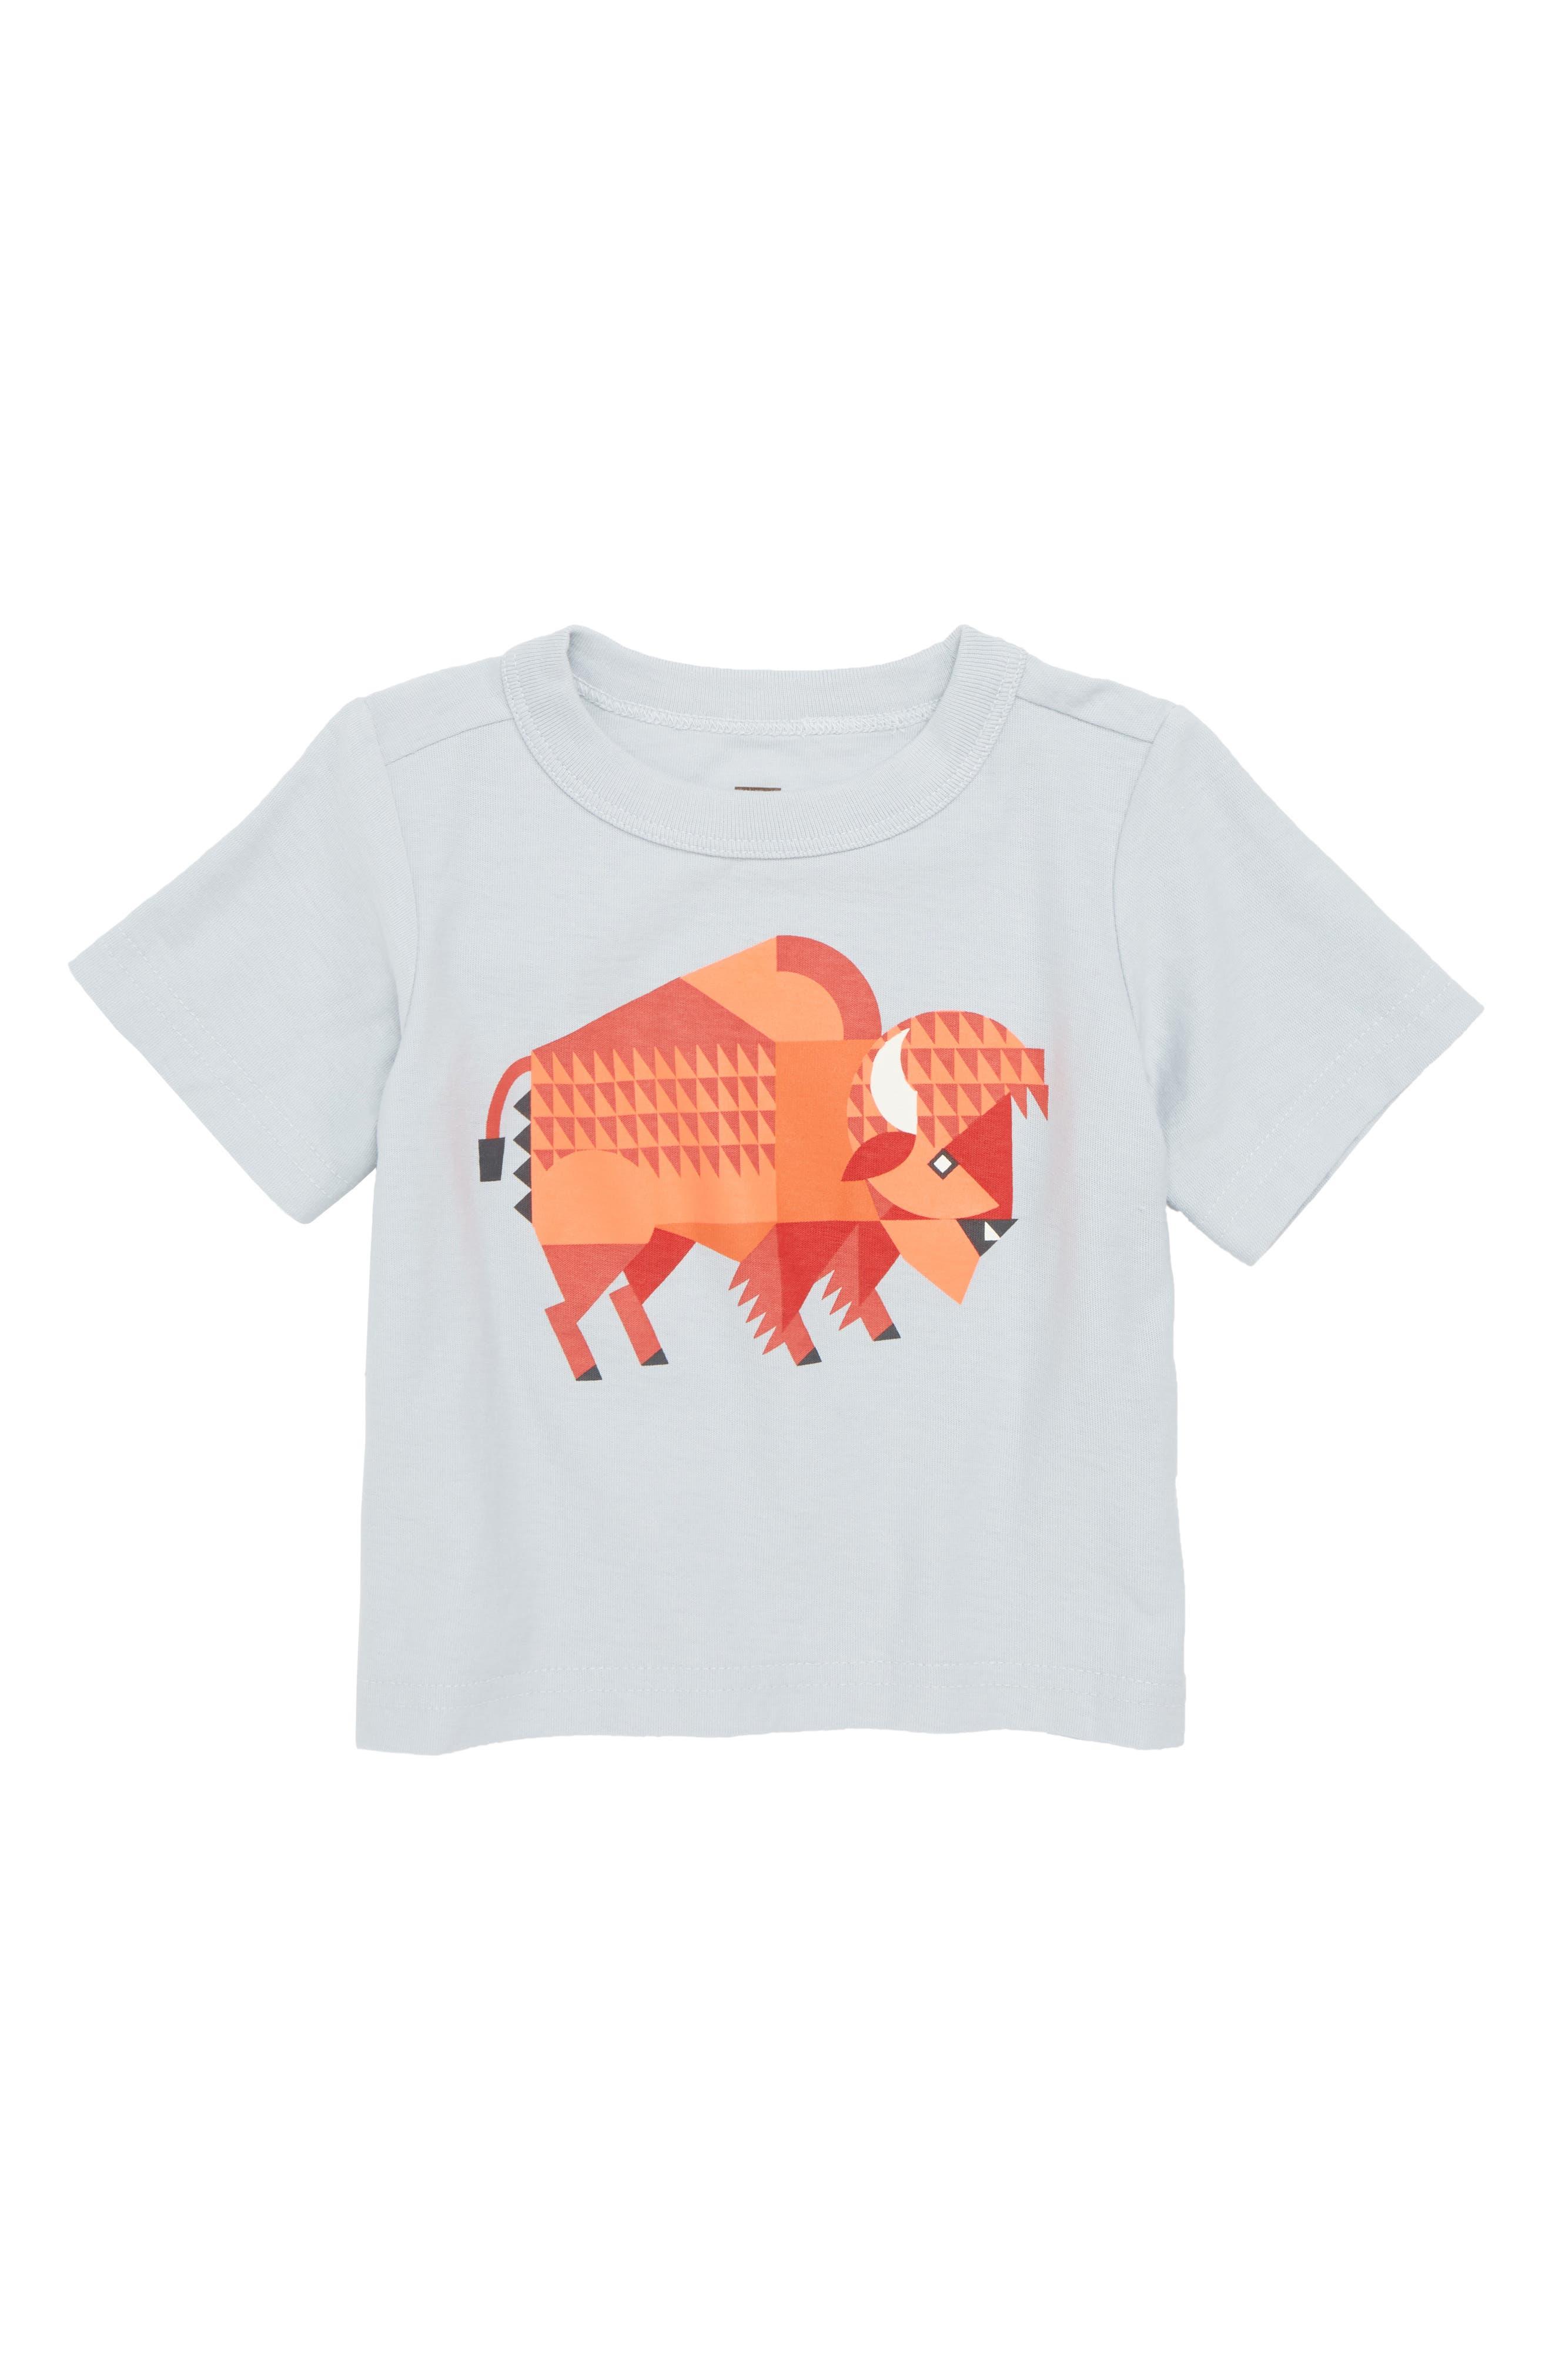 Bison T-Shirt,                         Main,                         color, Horizon